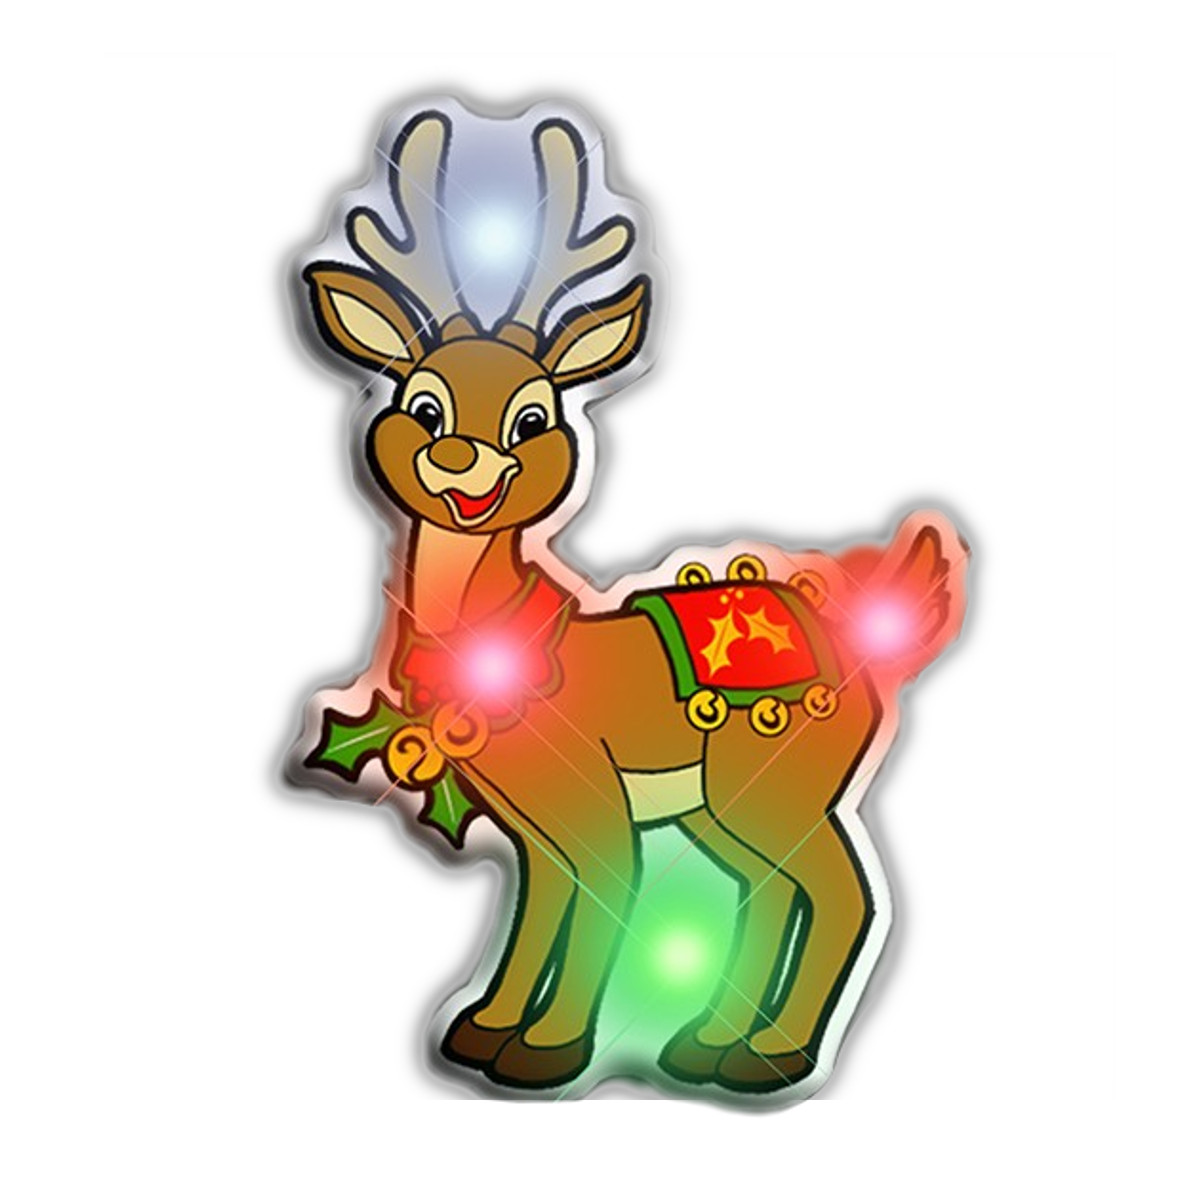 Rudolph The Reindeer Flashing Body Light Lapel Pins